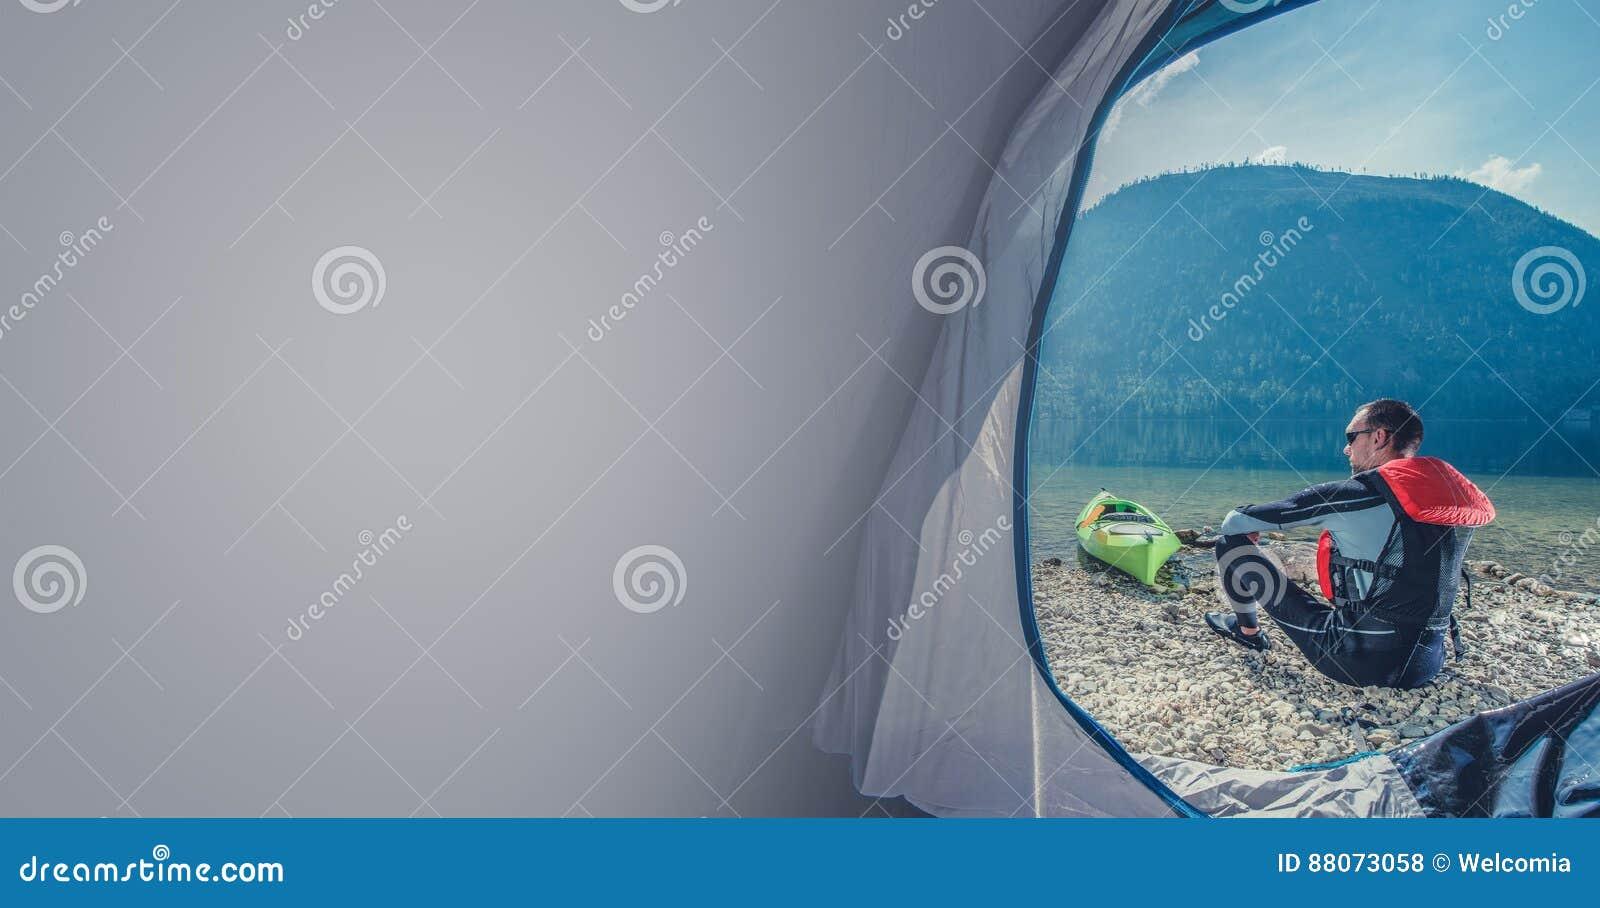 Lake Shore Camping with Kayak